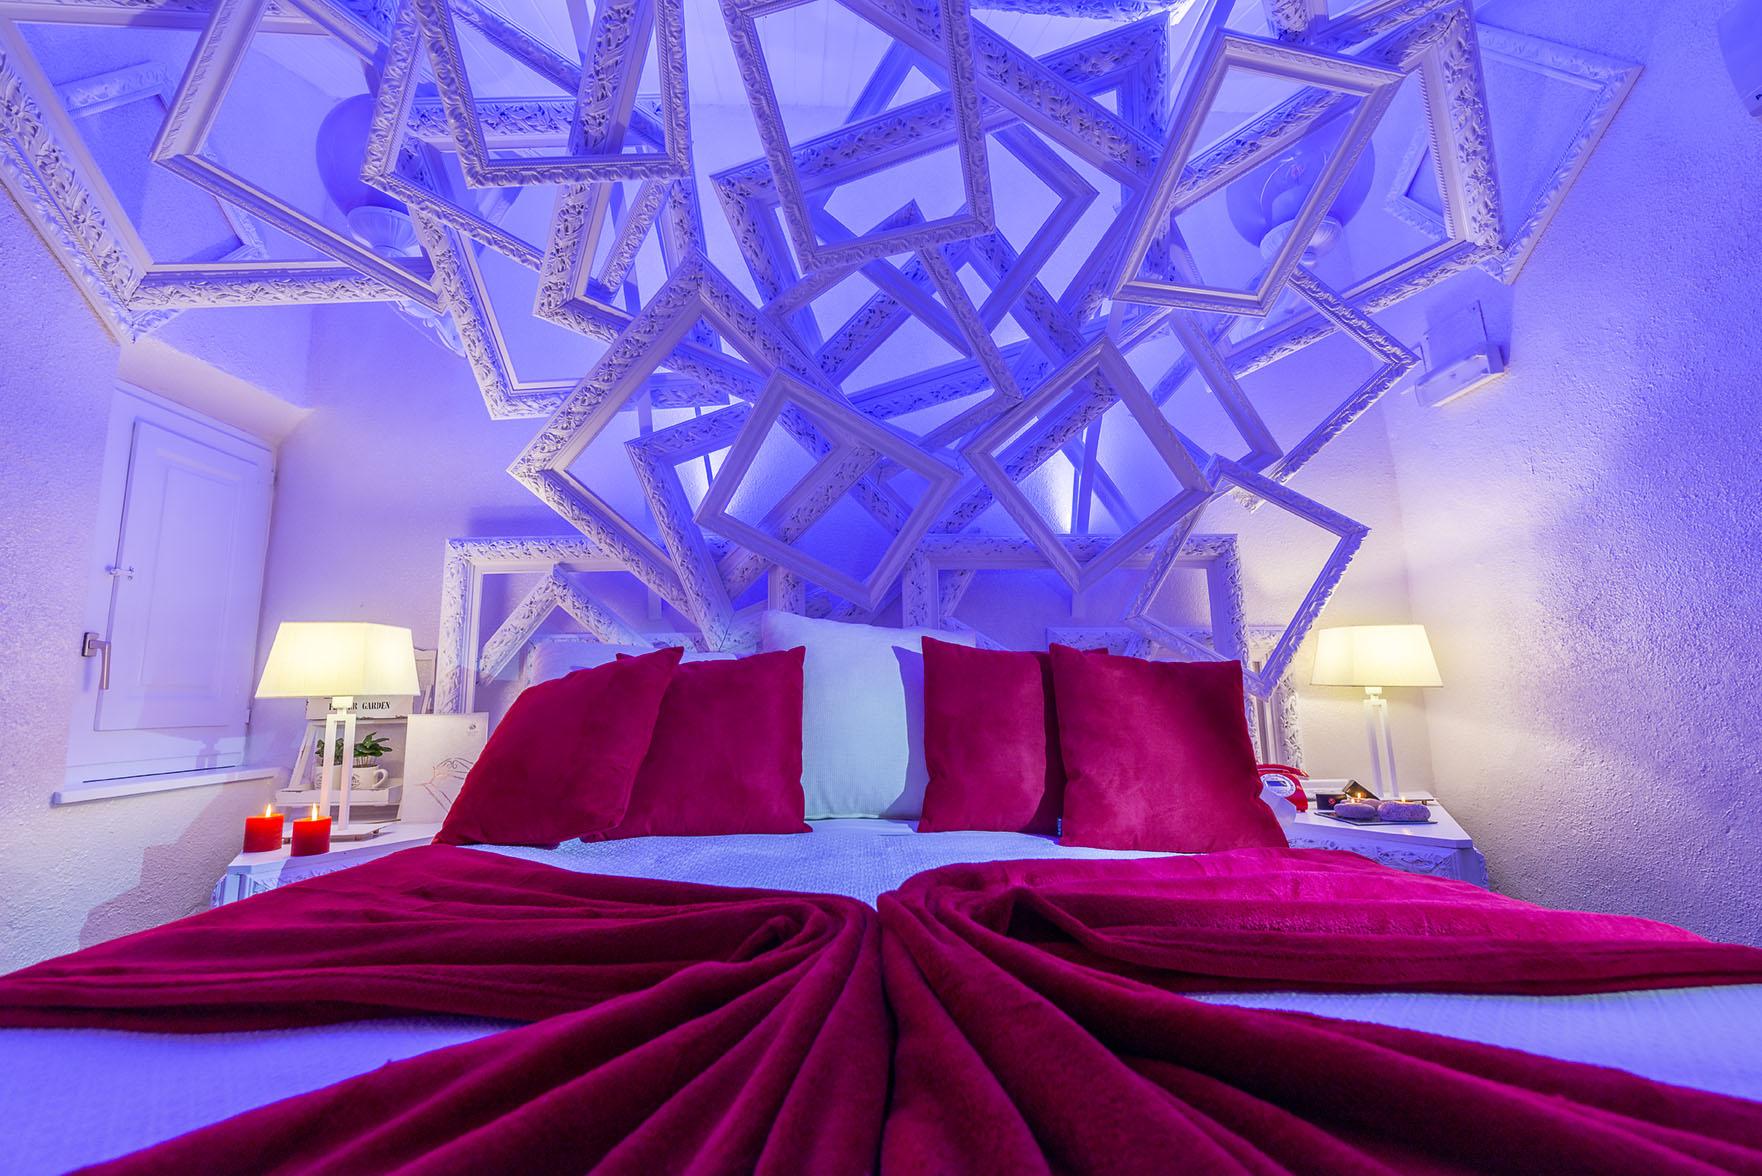 Salles Hotels Masía Design